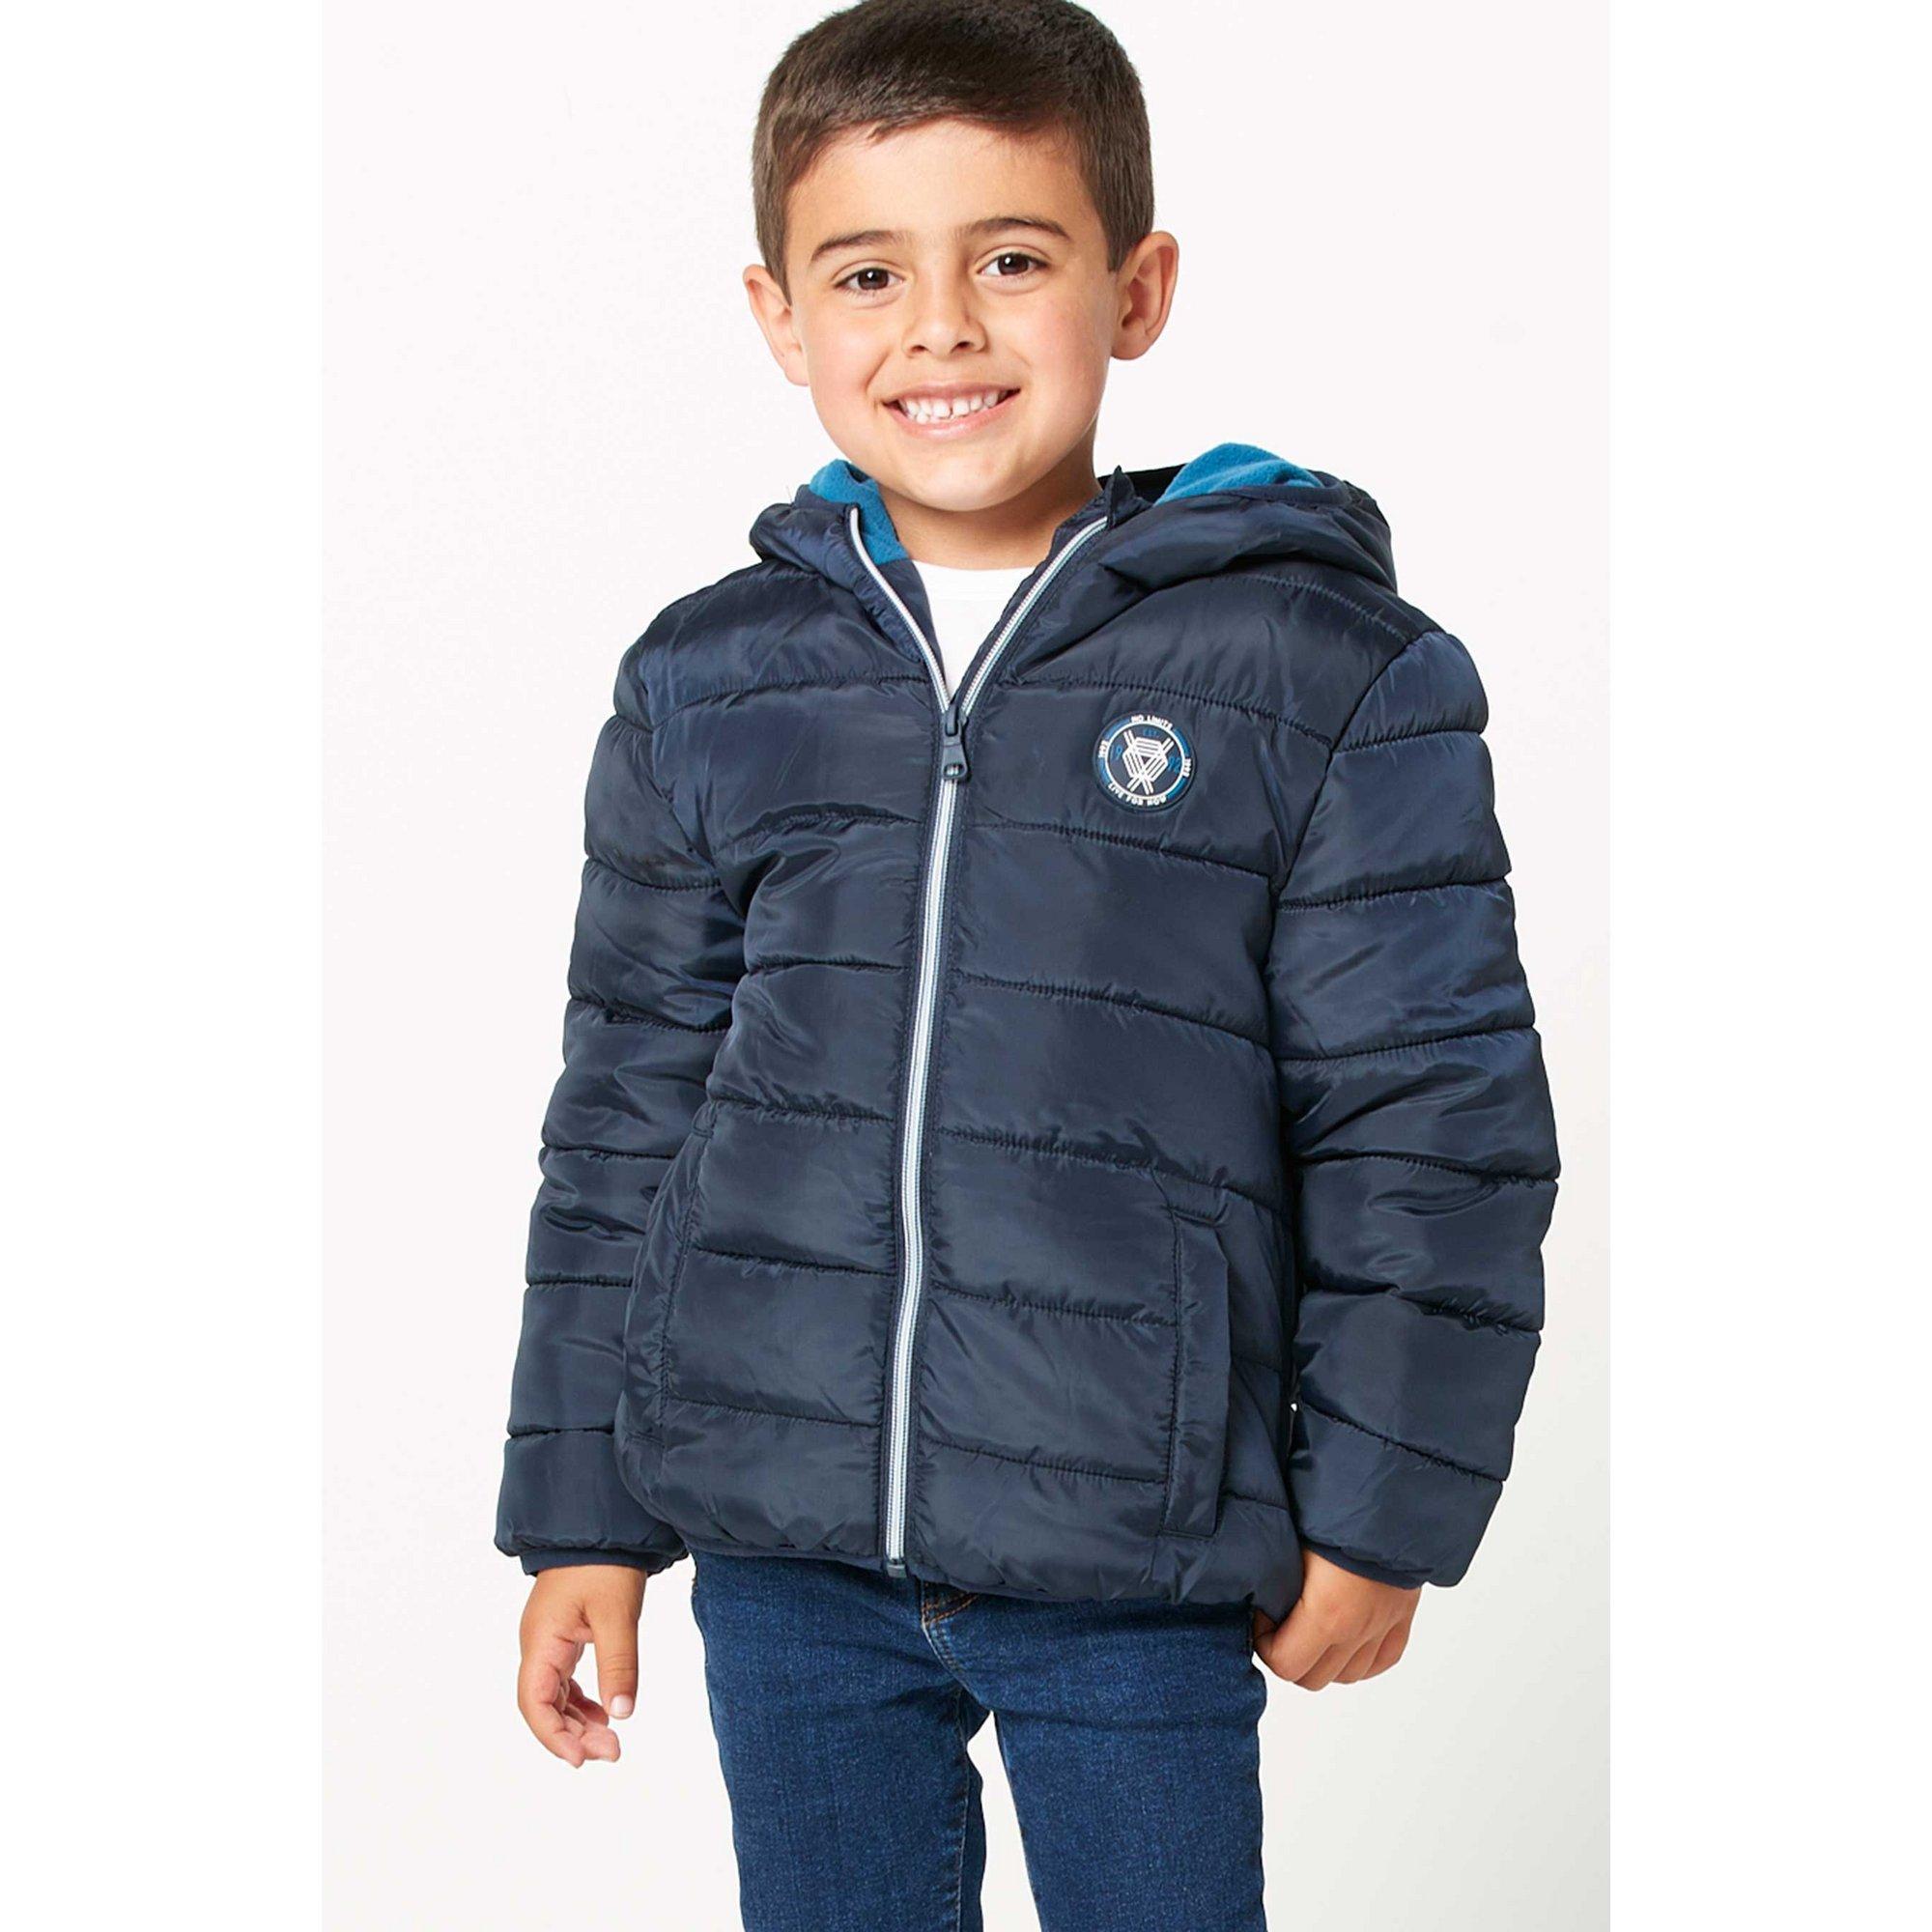 Image of Younger Boys School Fleece Lined Padded Navy Jacket